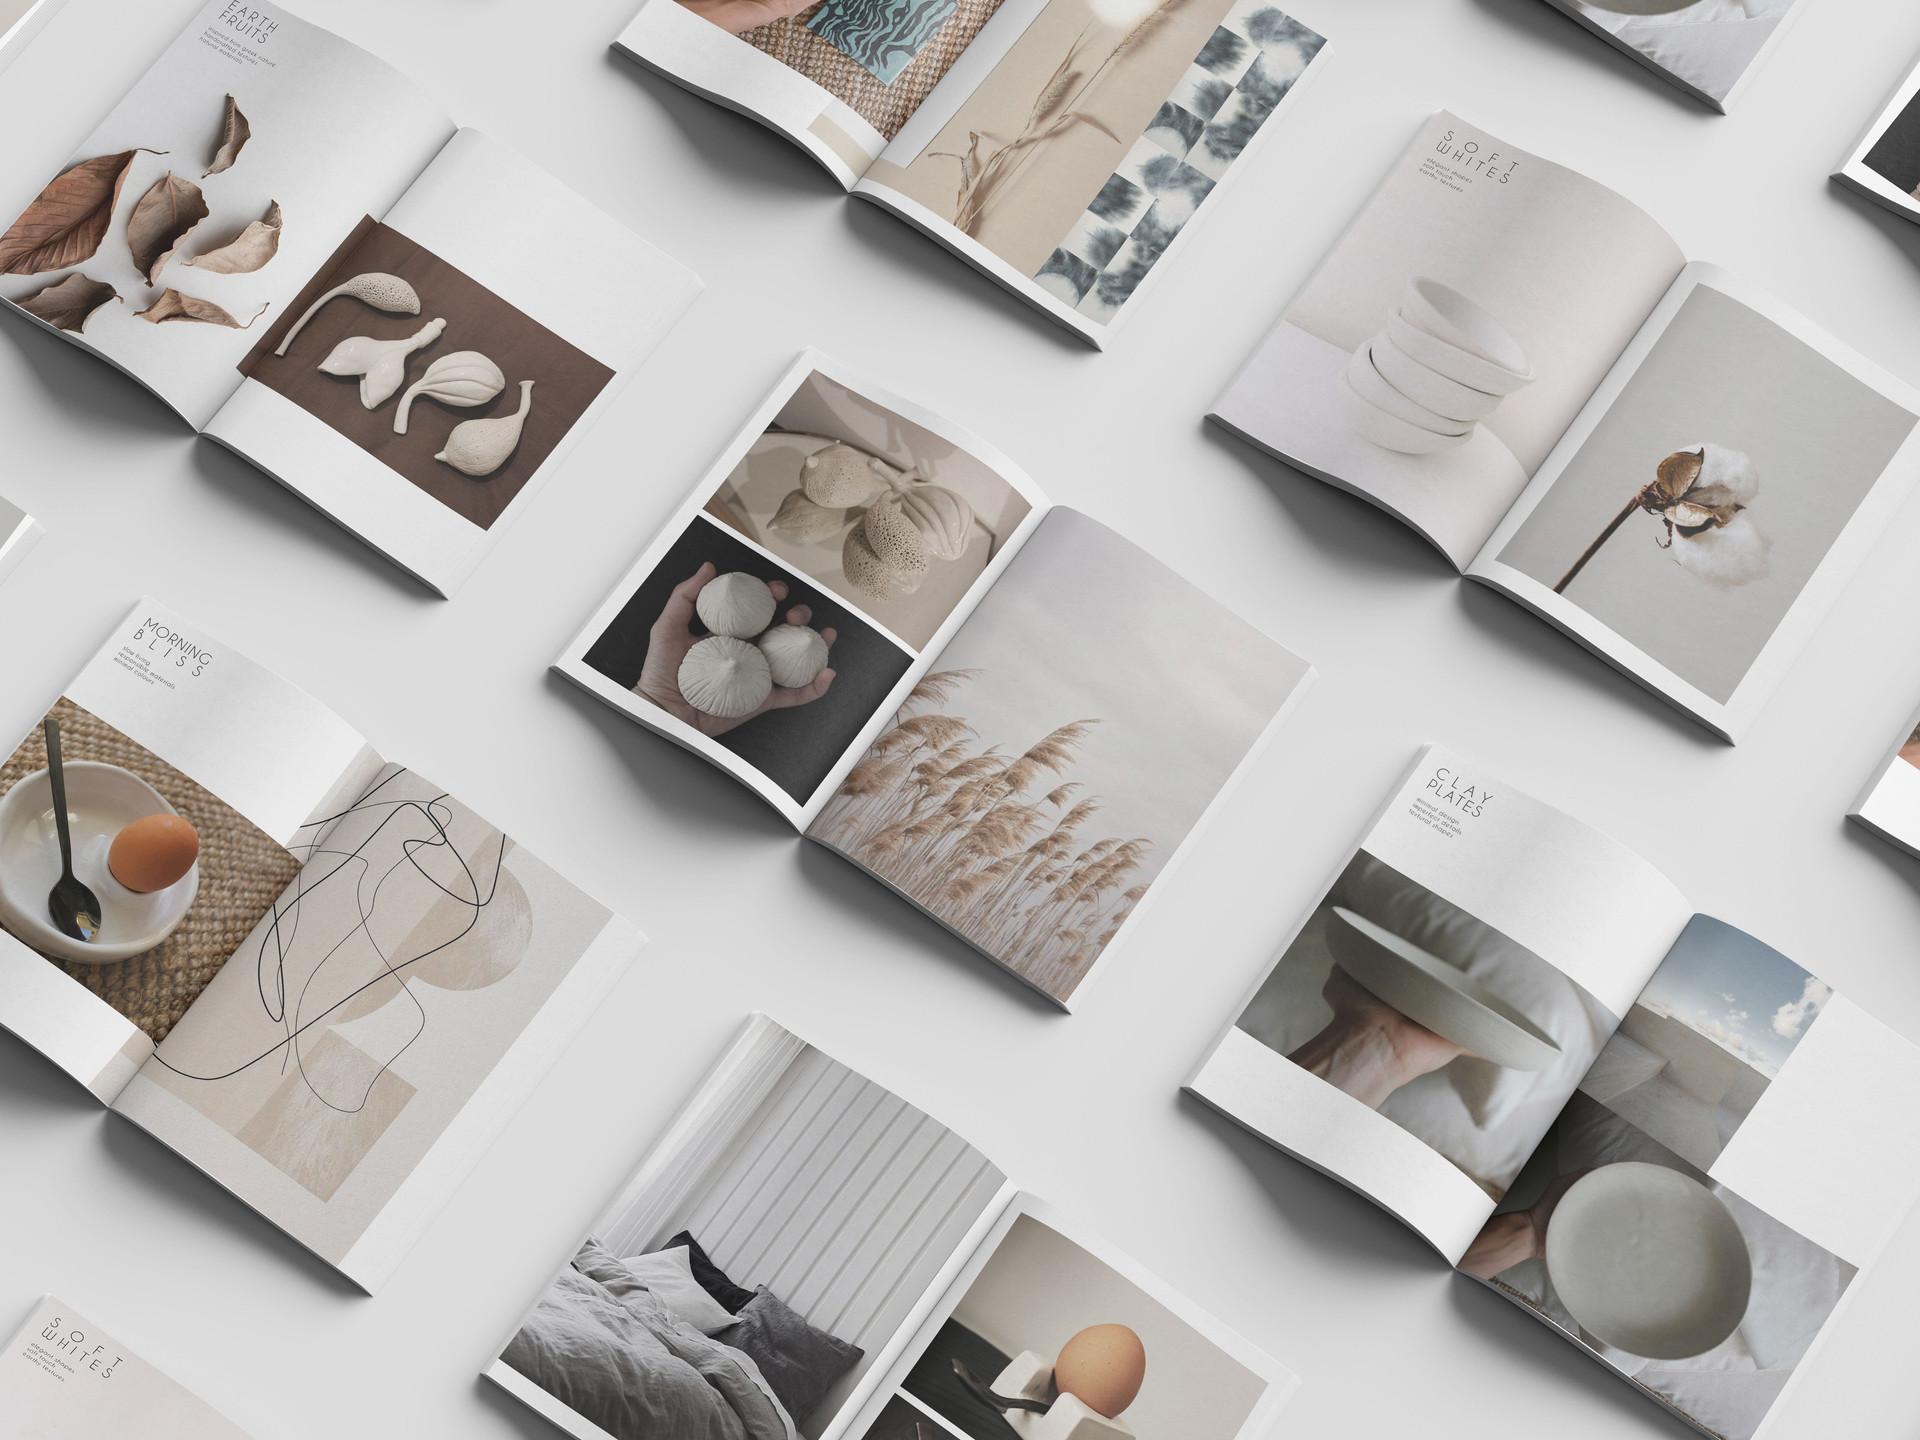 vf-ceramics_pages_web.jpg